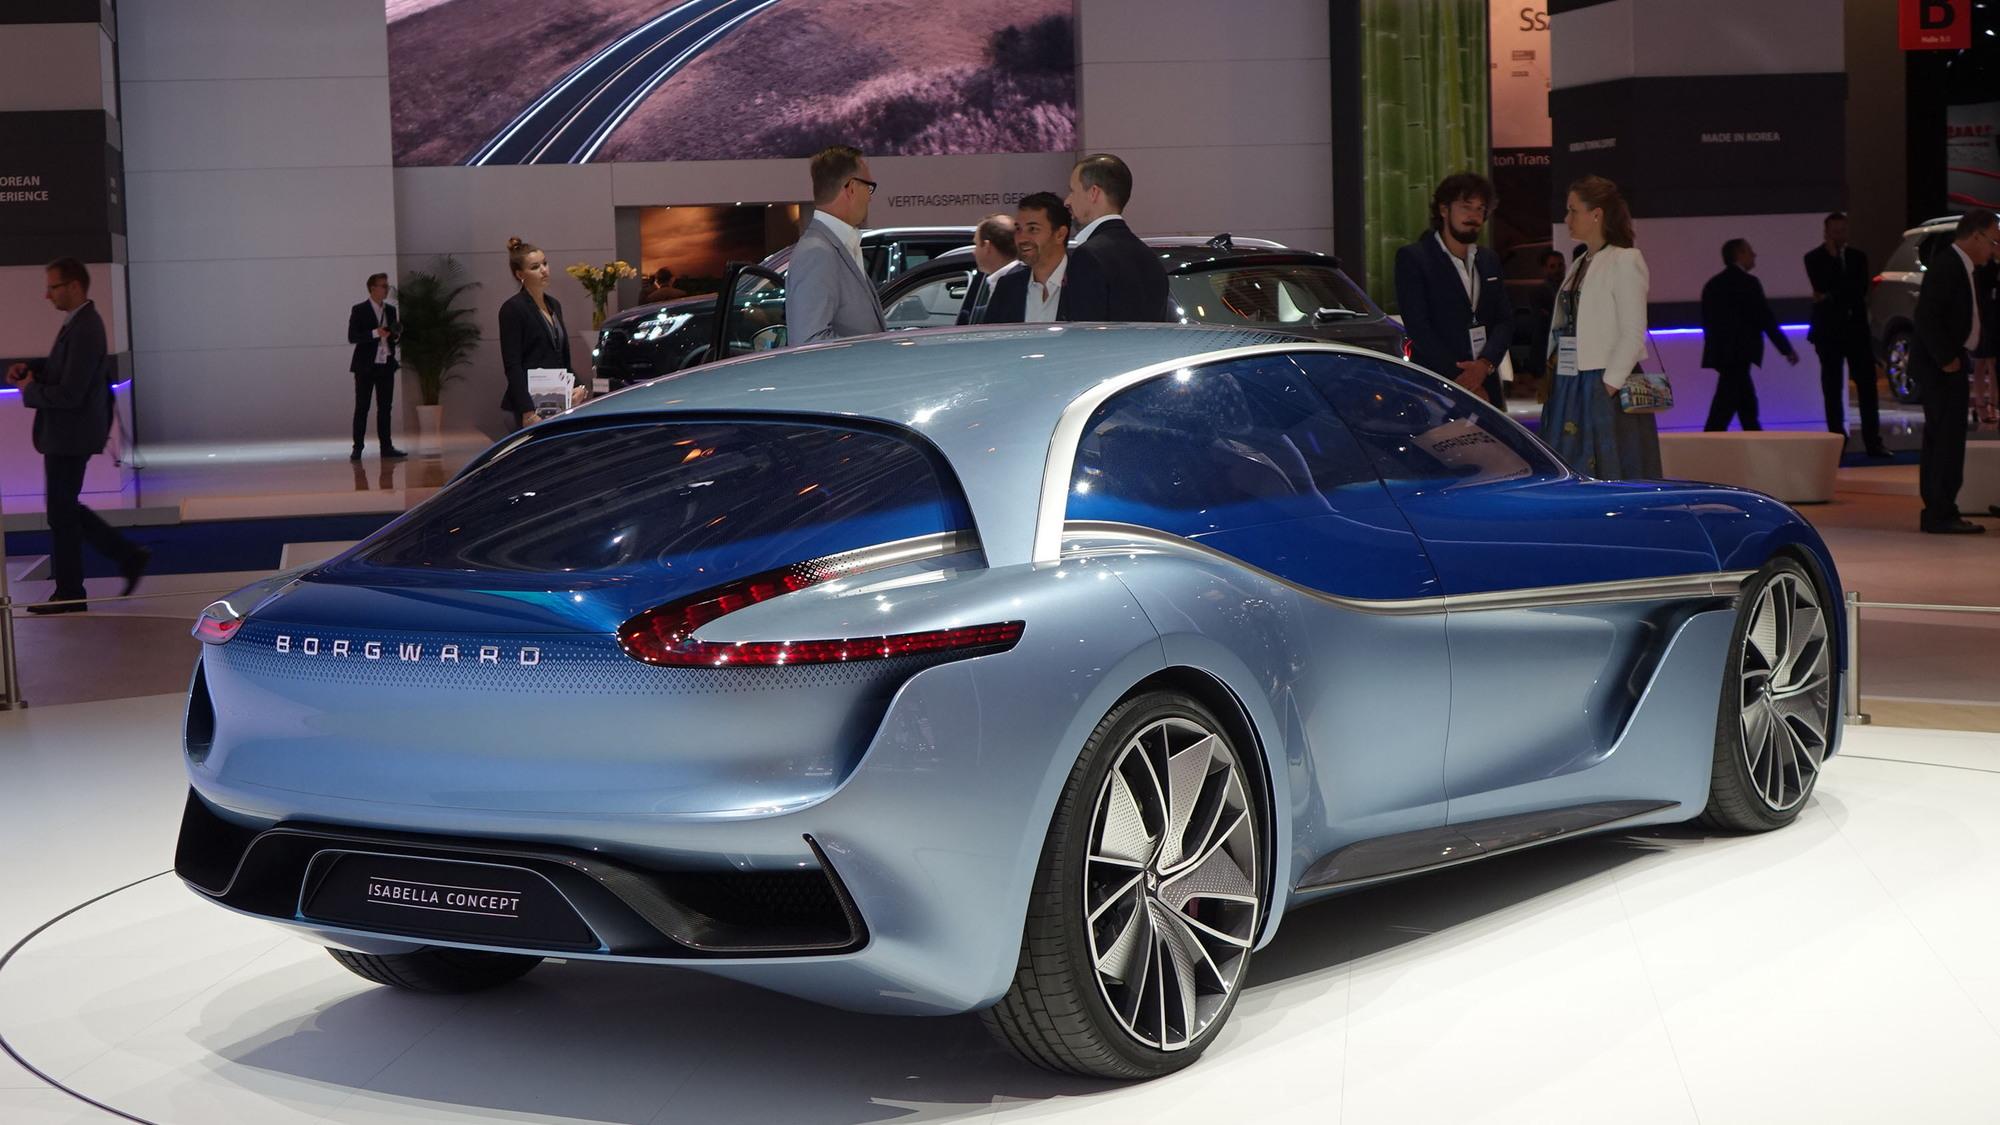 Borgward Isabella concept, 2017 Frankfurt auto show